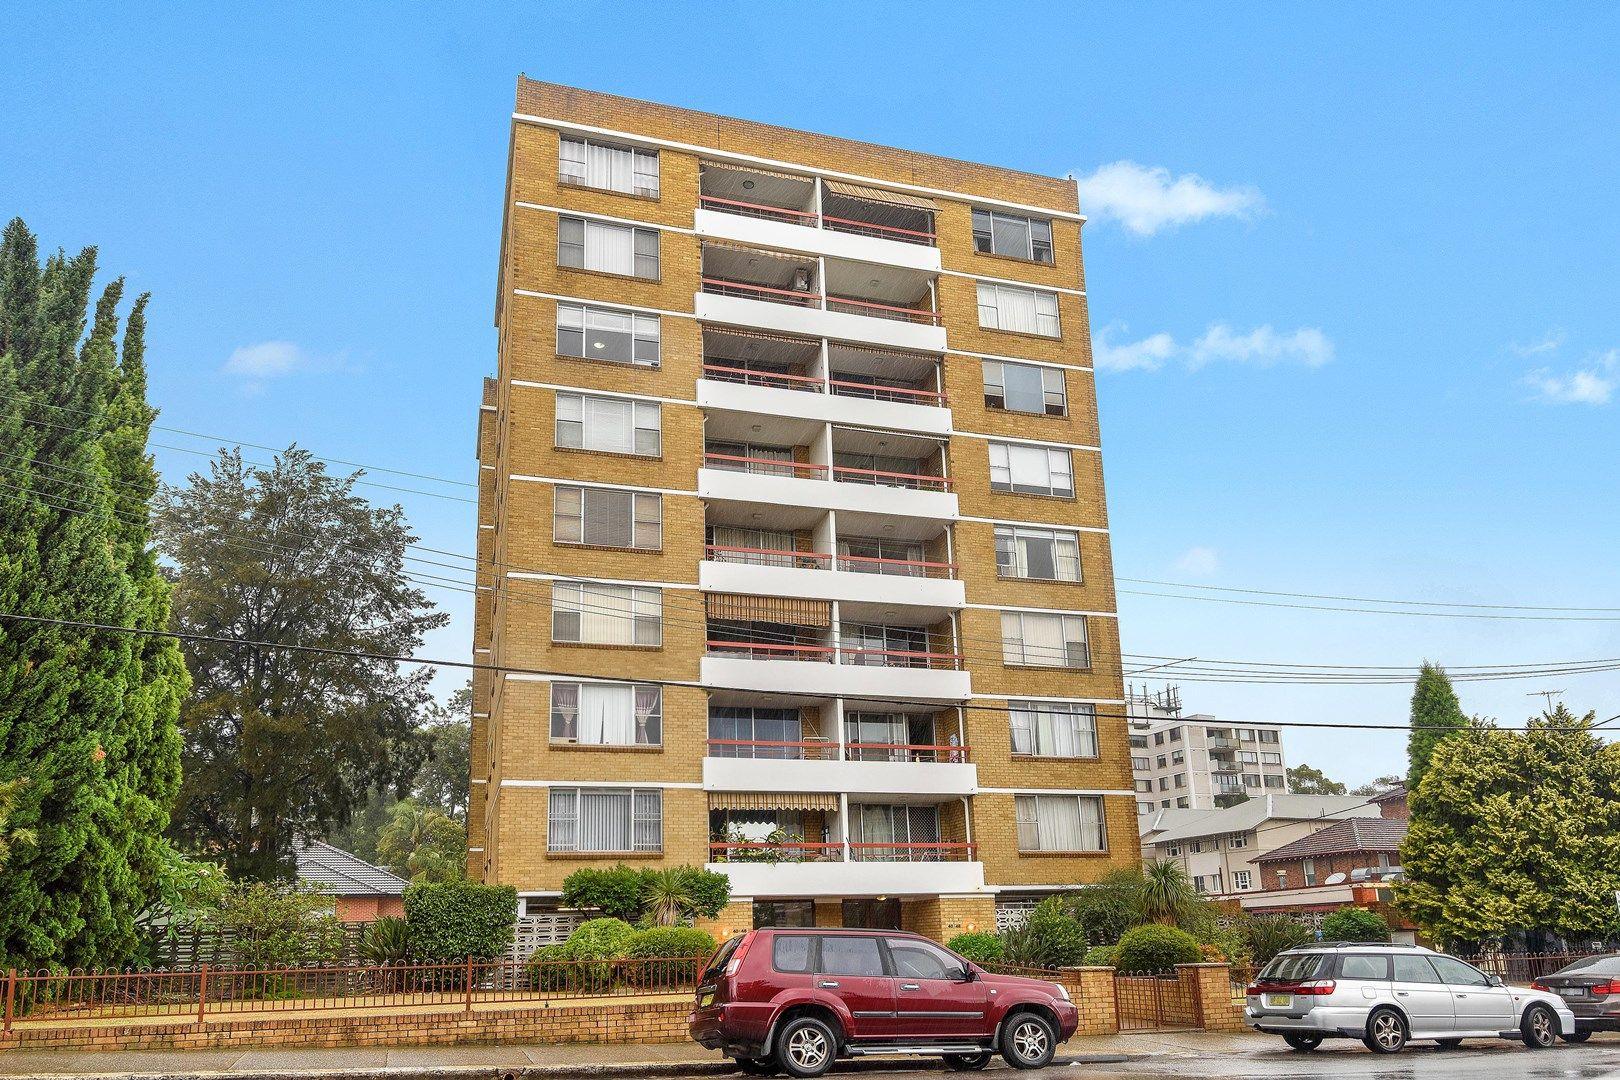 2B/40-46 Mosely Street, Strathfield NSW 2135, Image 0